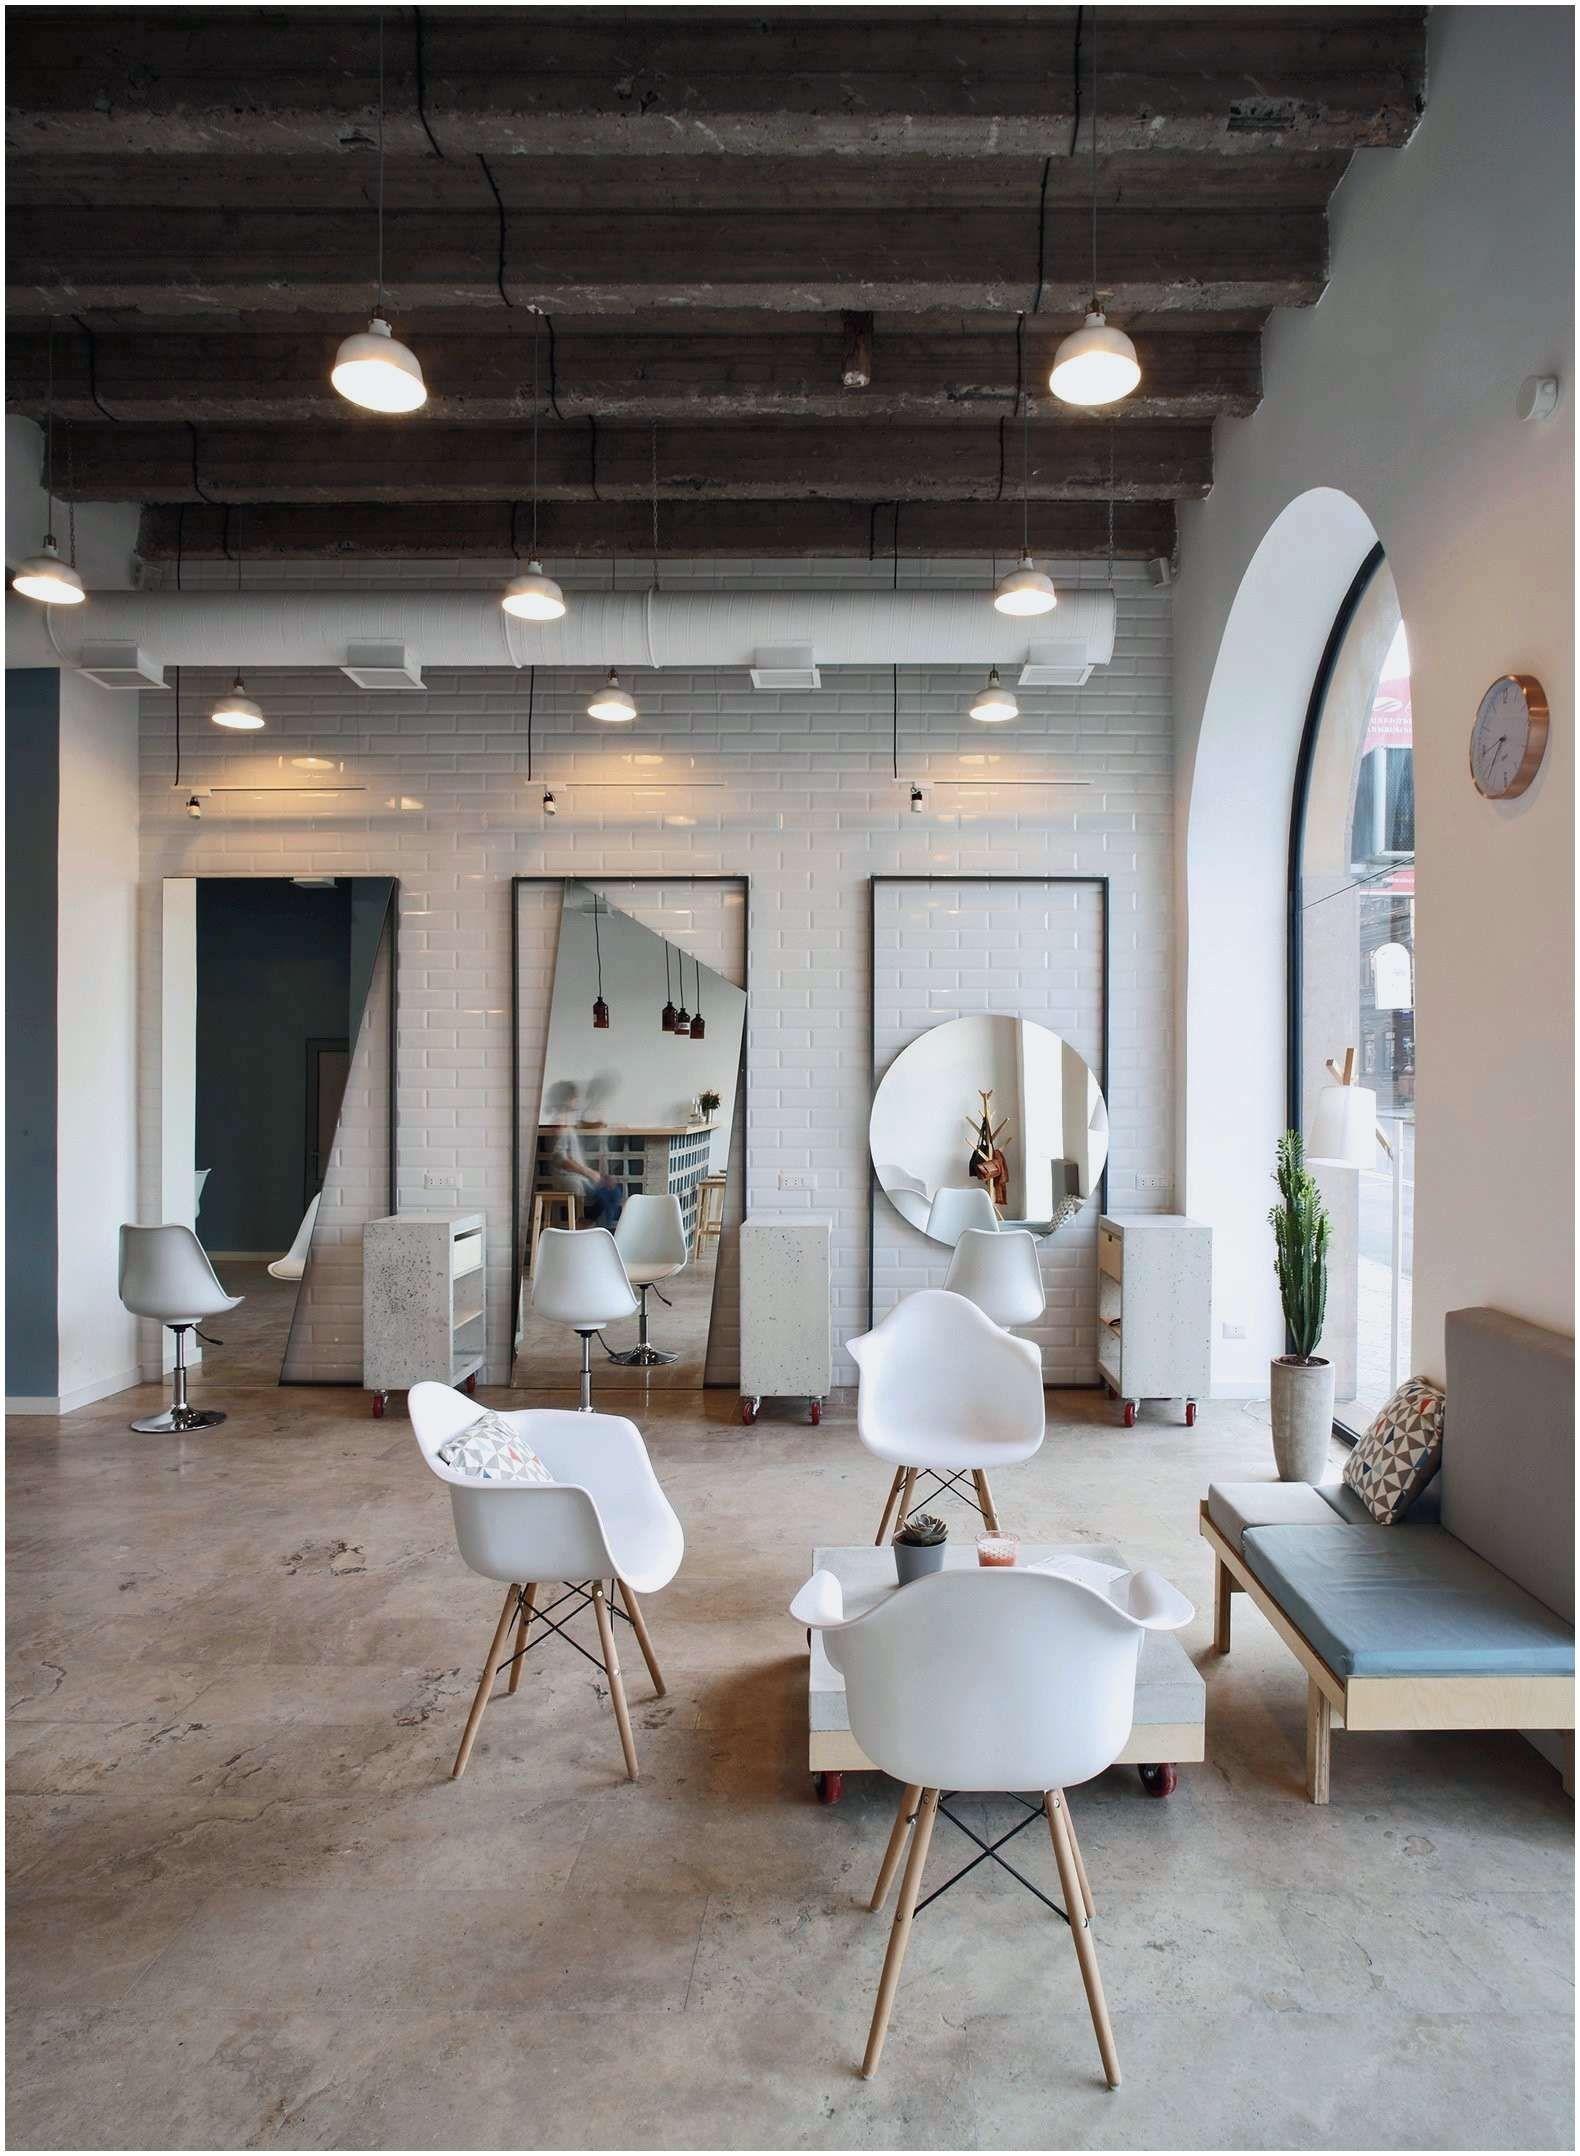 50 Idee Deco Salon Noir Blanc Gris Desain Tukang Cukur Minimalis